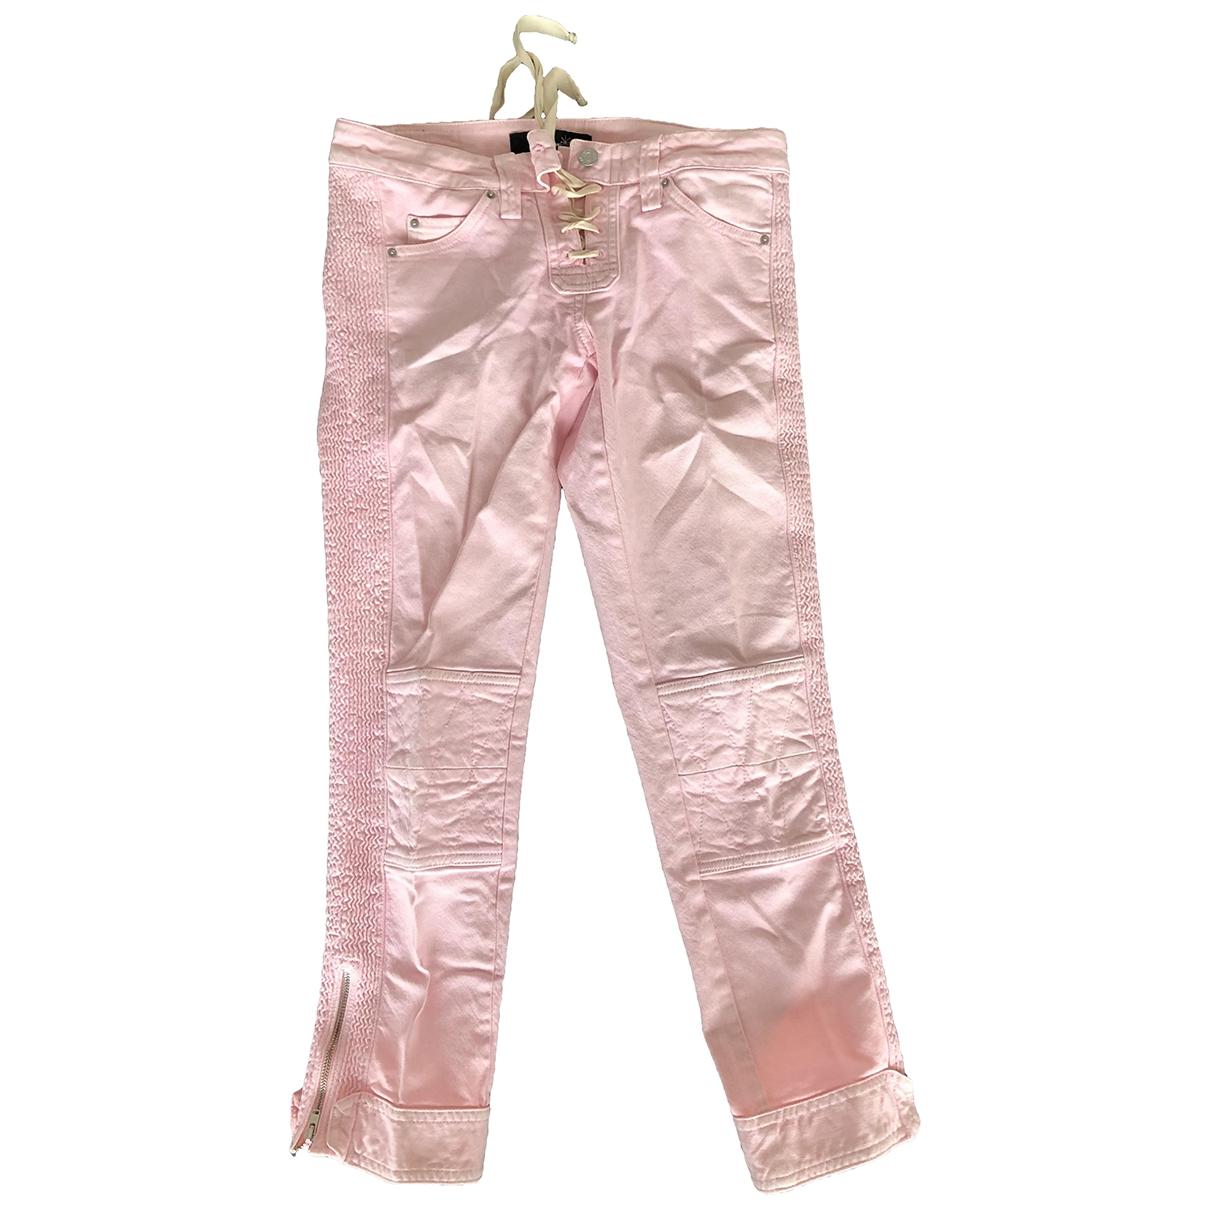 Isabel Marant Etoile \N Pink Denim - Jeans Trousers for Women 0 0-5